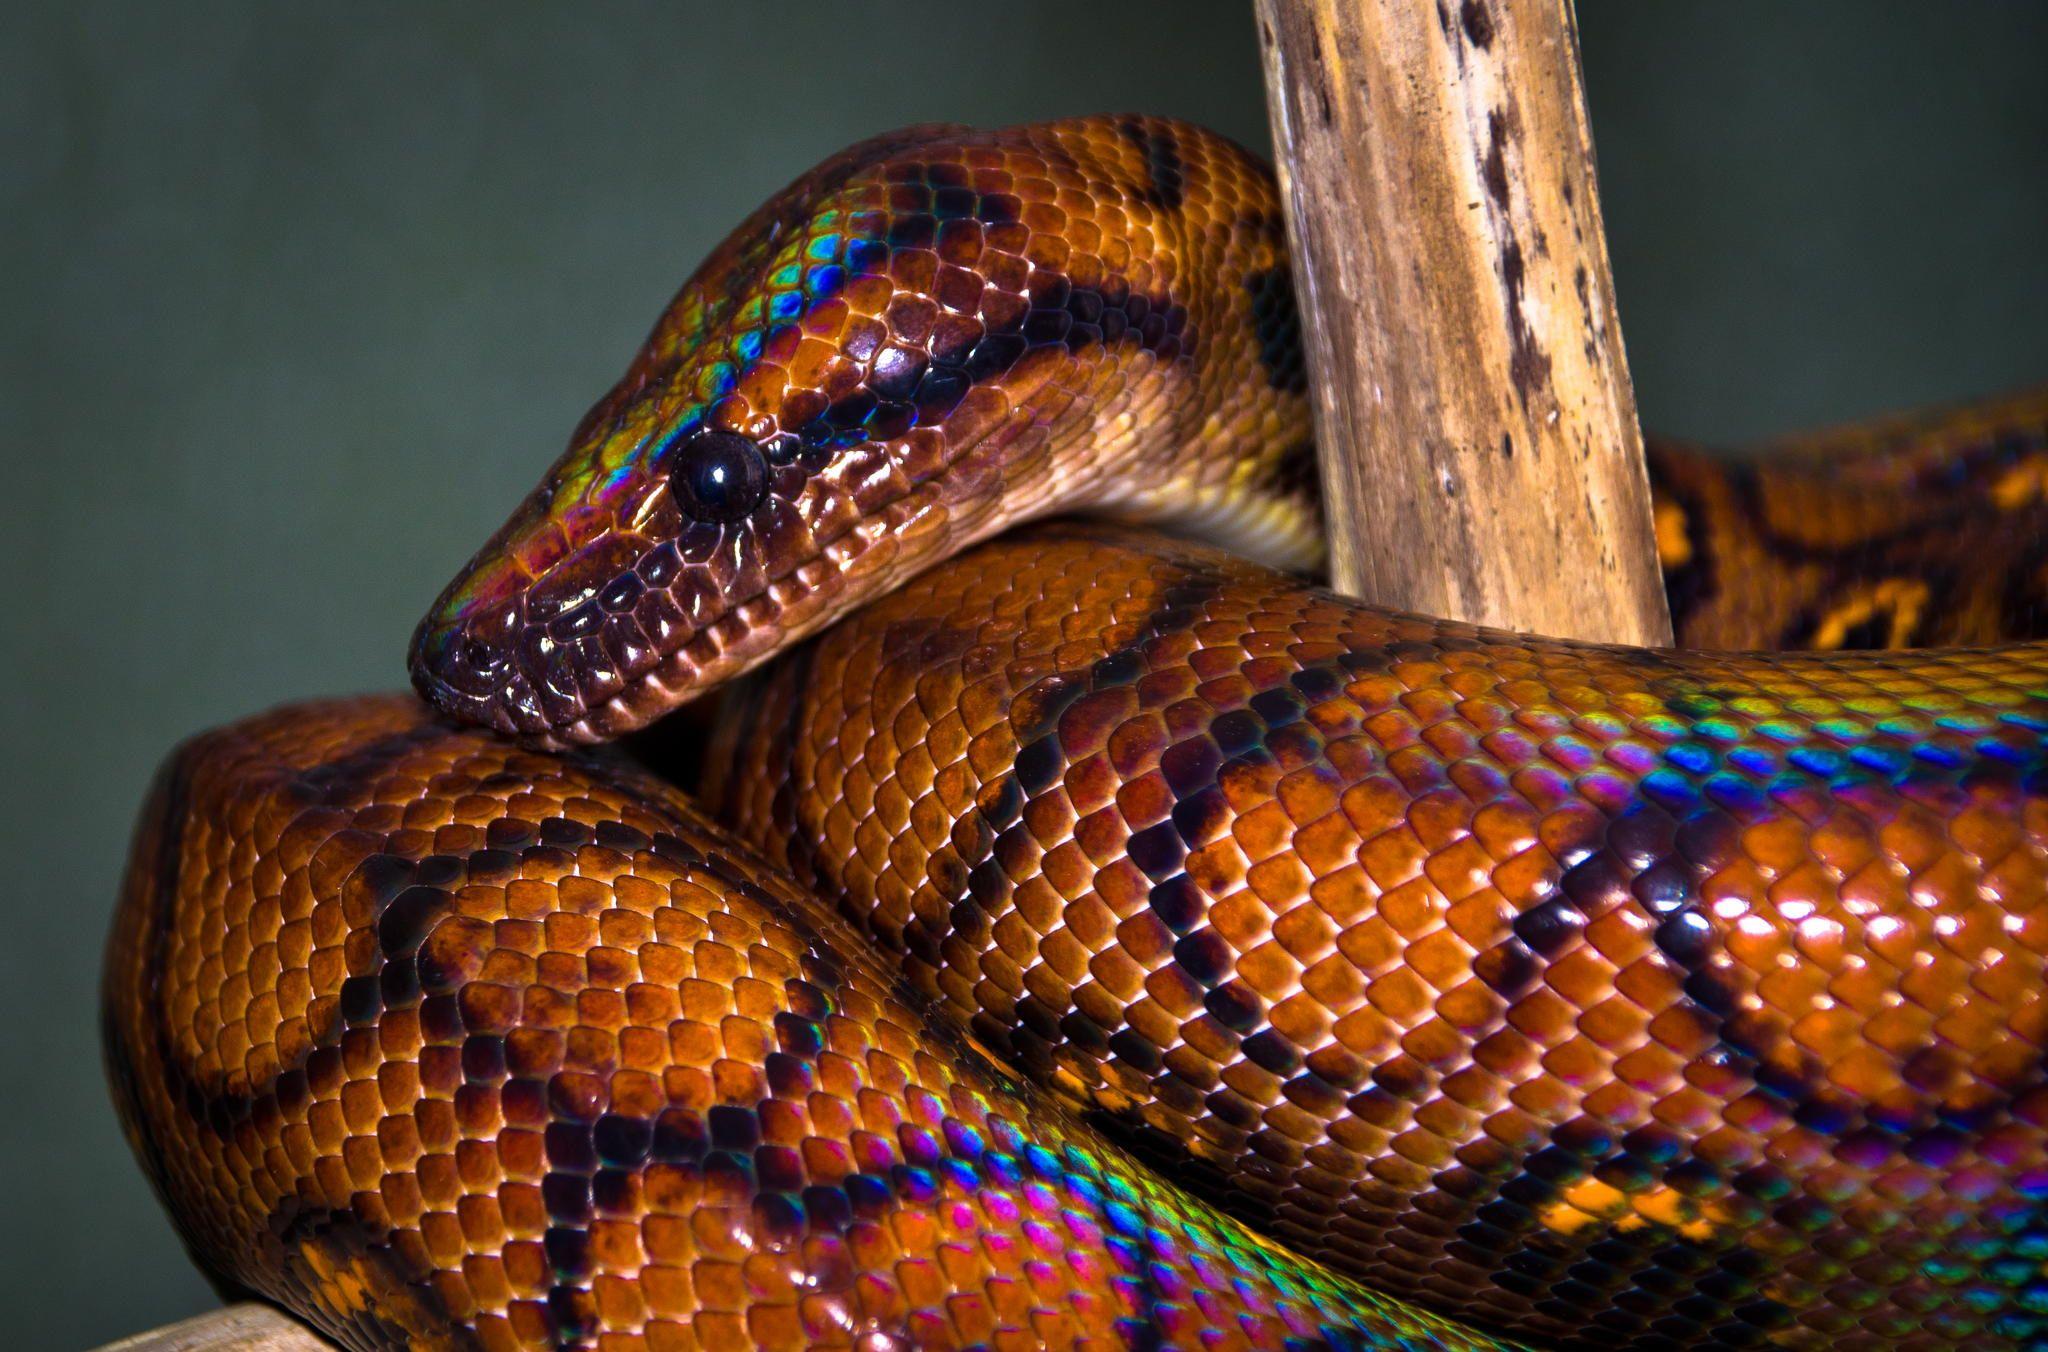 Rainbow Boa Google Search Pet Snake Snake Brazilian Rainbow Boa